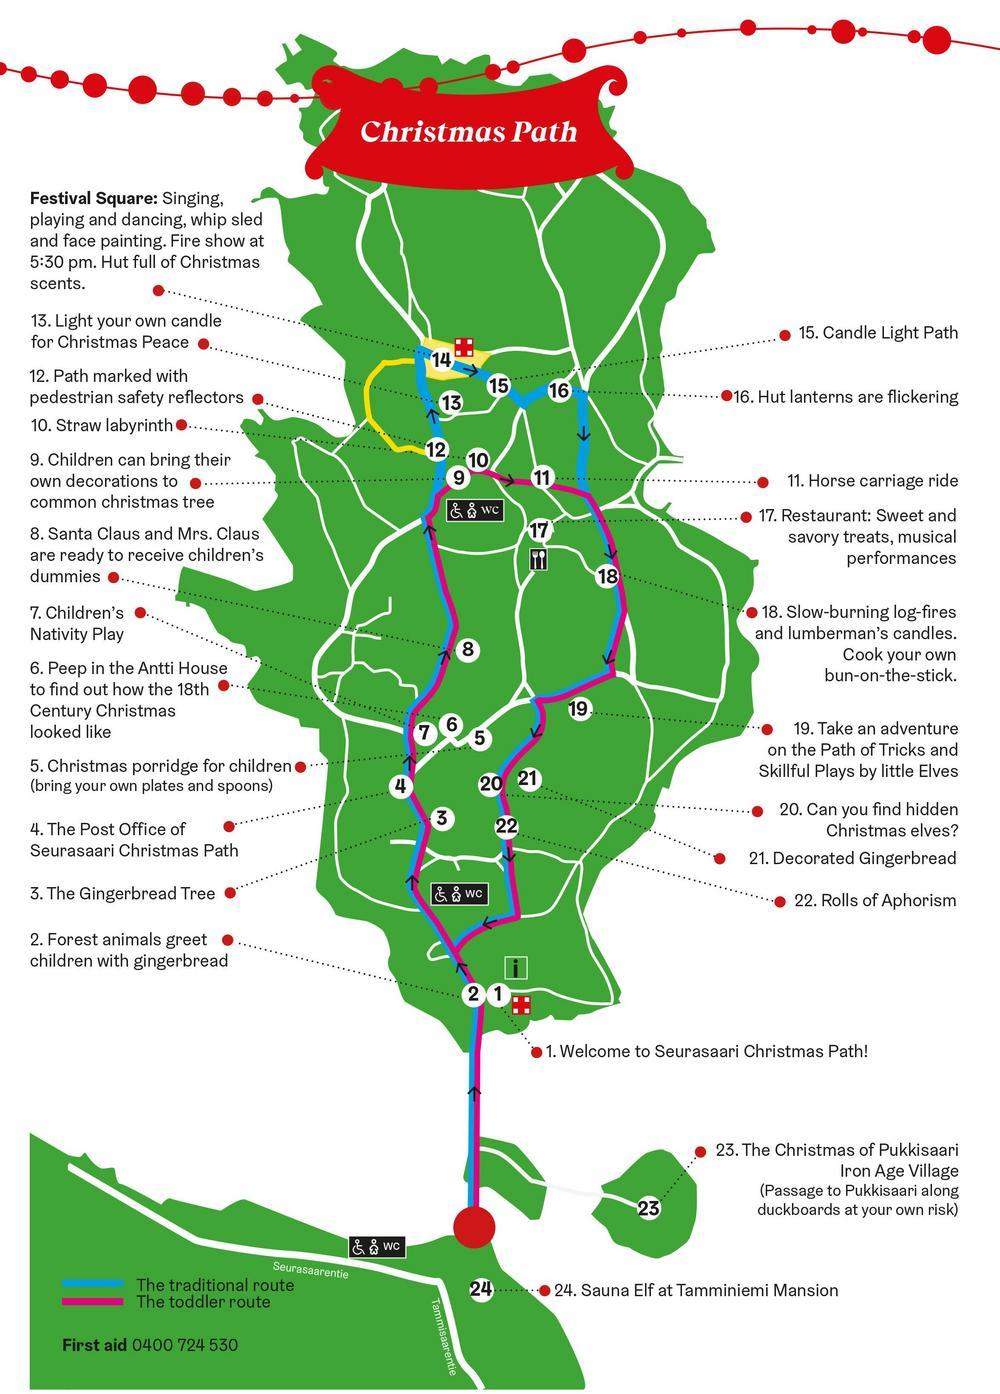 The programme of Seurasaari Christmas Path